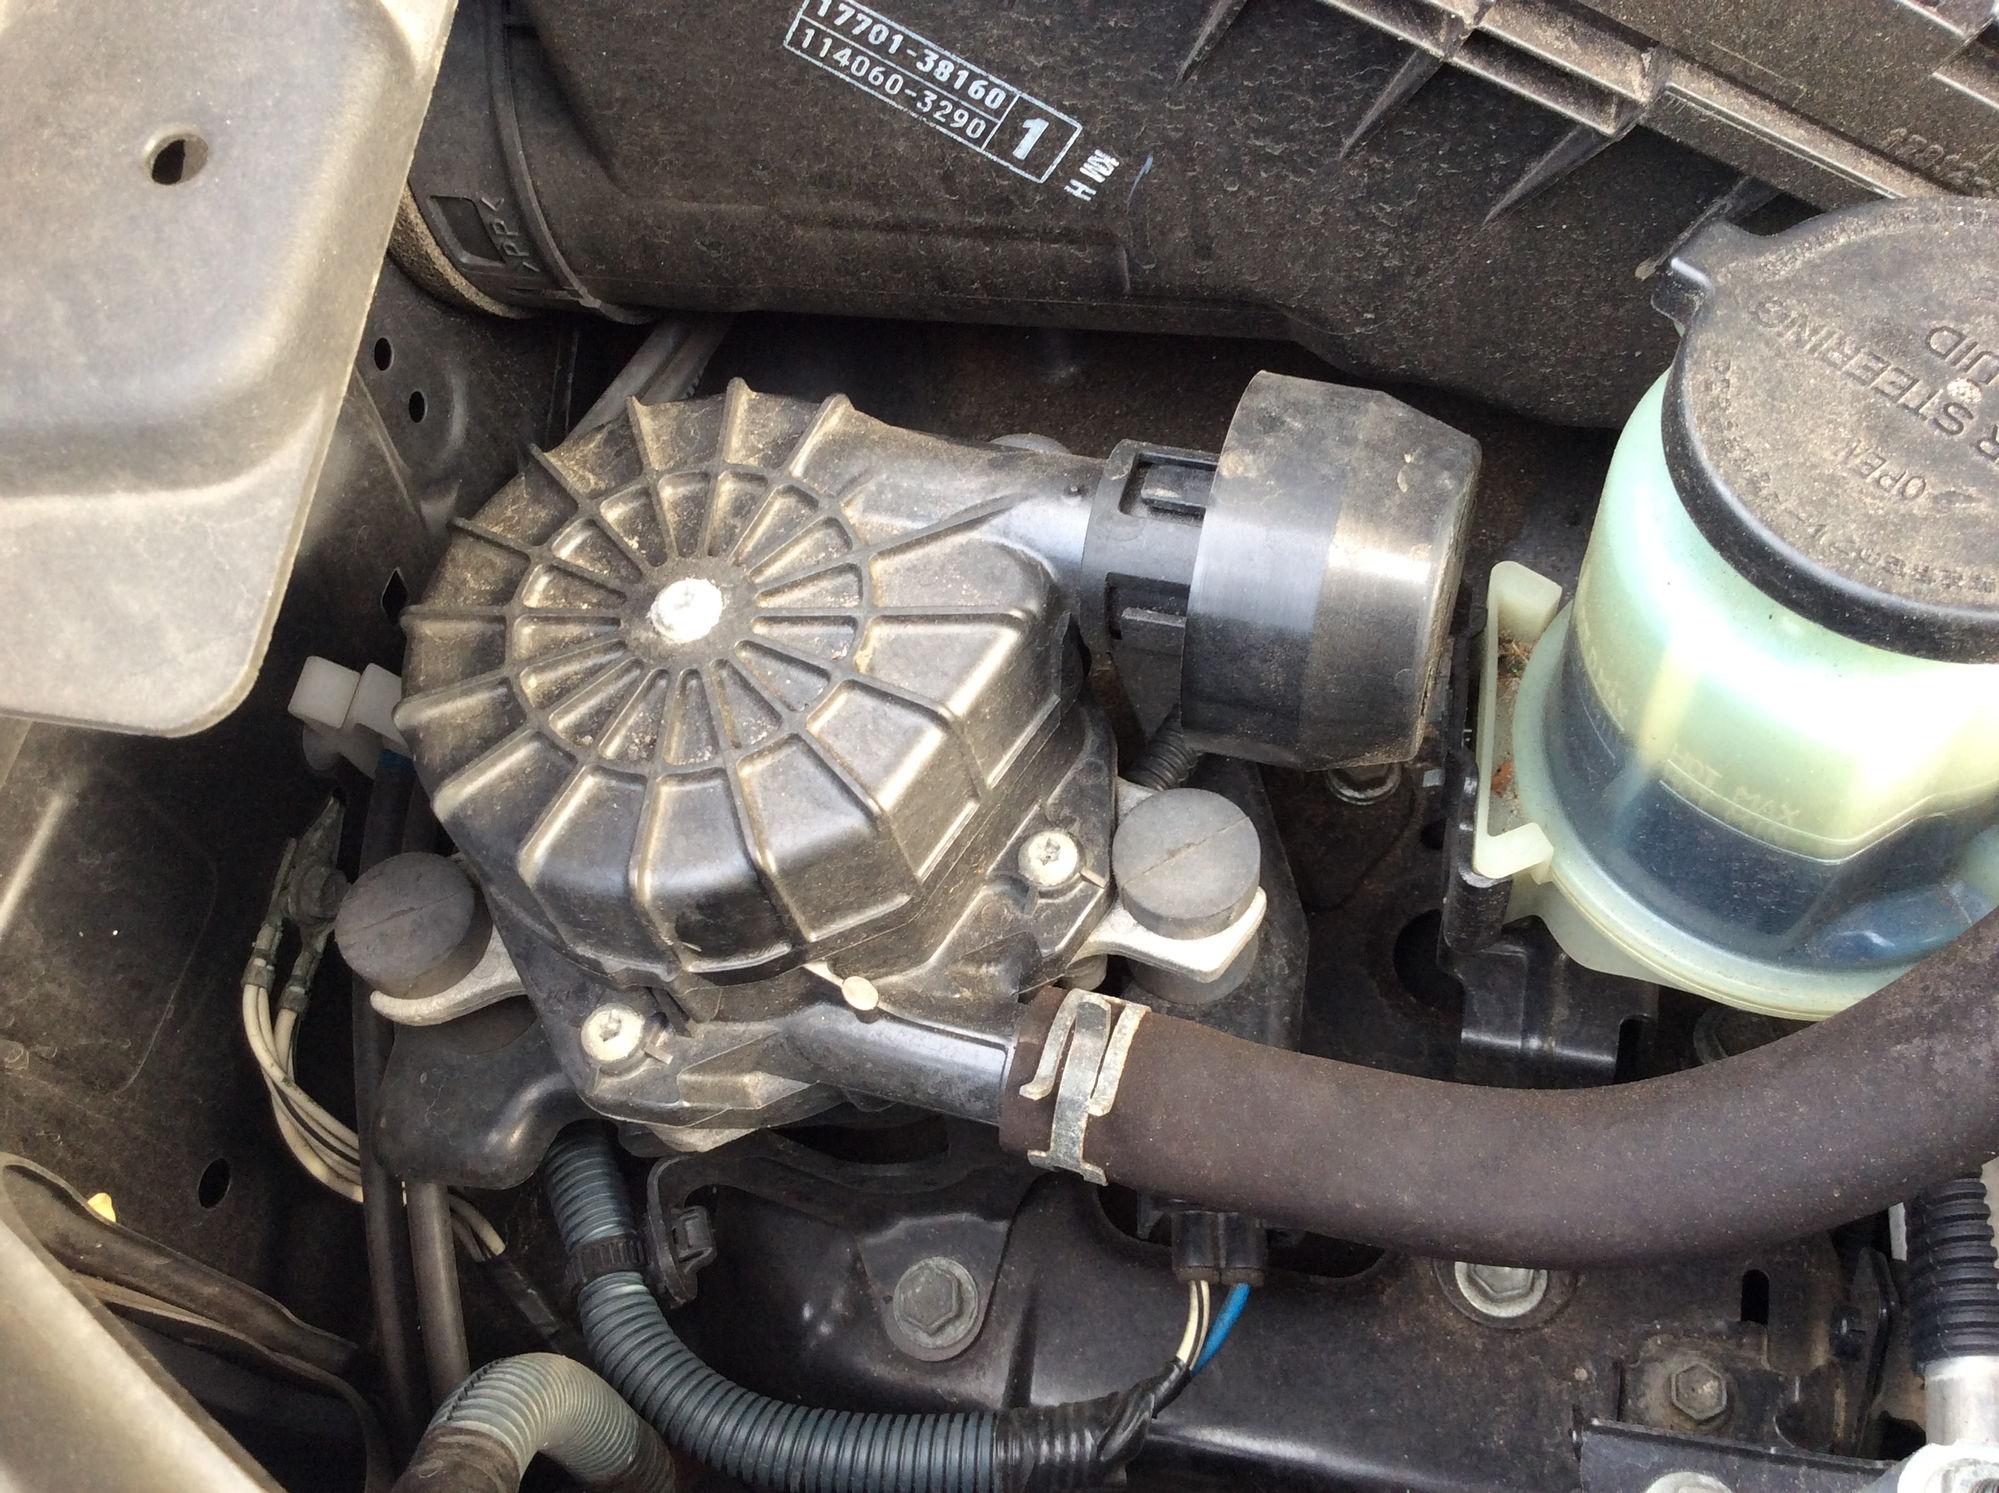 Gx460 Secondary Air Intake Pump Page 2 Clublexus